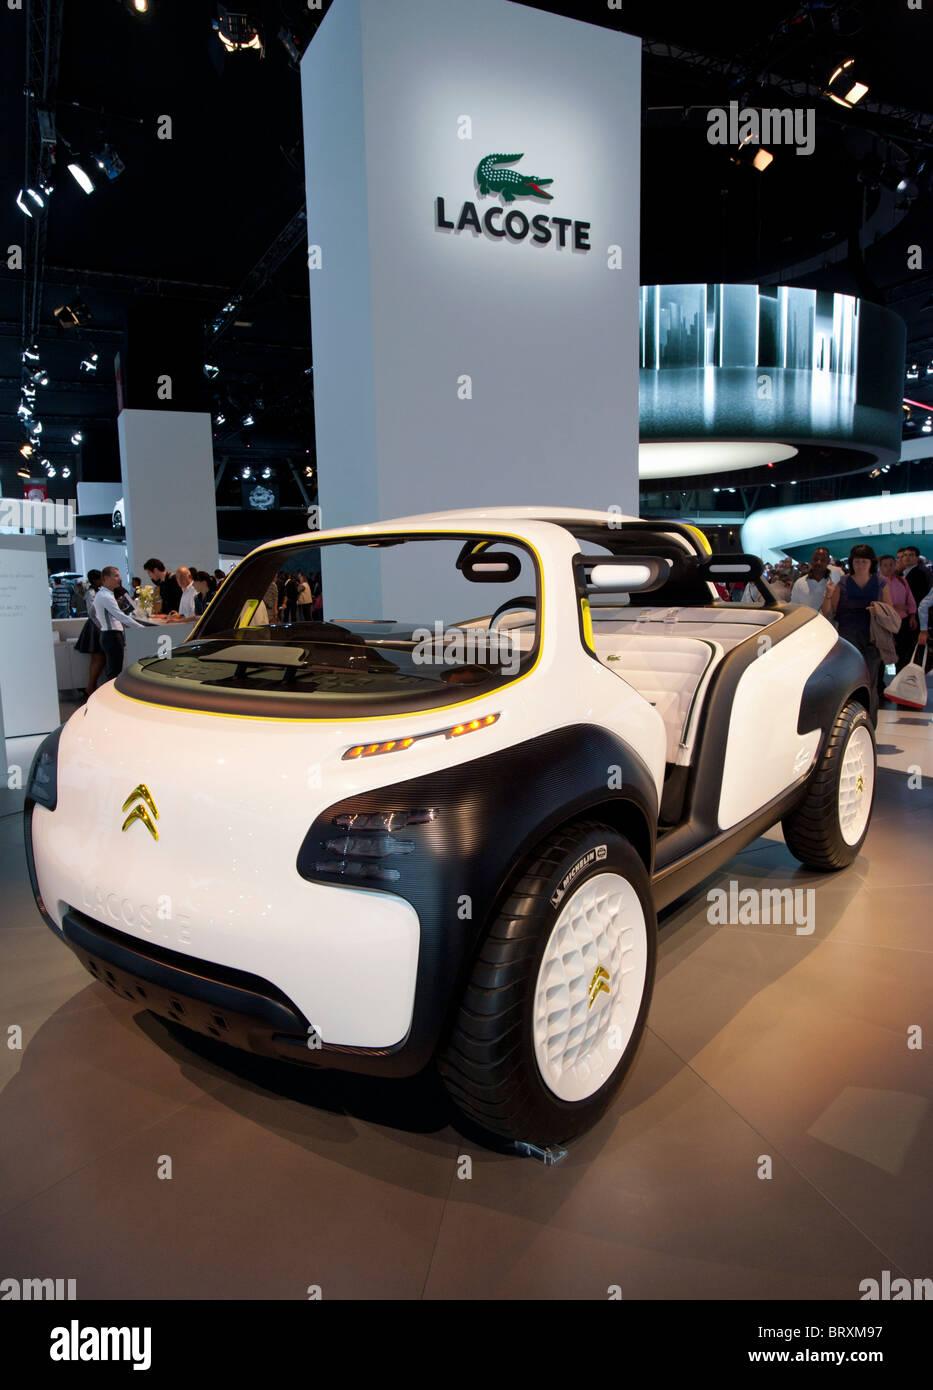 Citroen Lacoste-Konzept-Fahrzeug auf der Paris Motor Show 2010 Stockbild